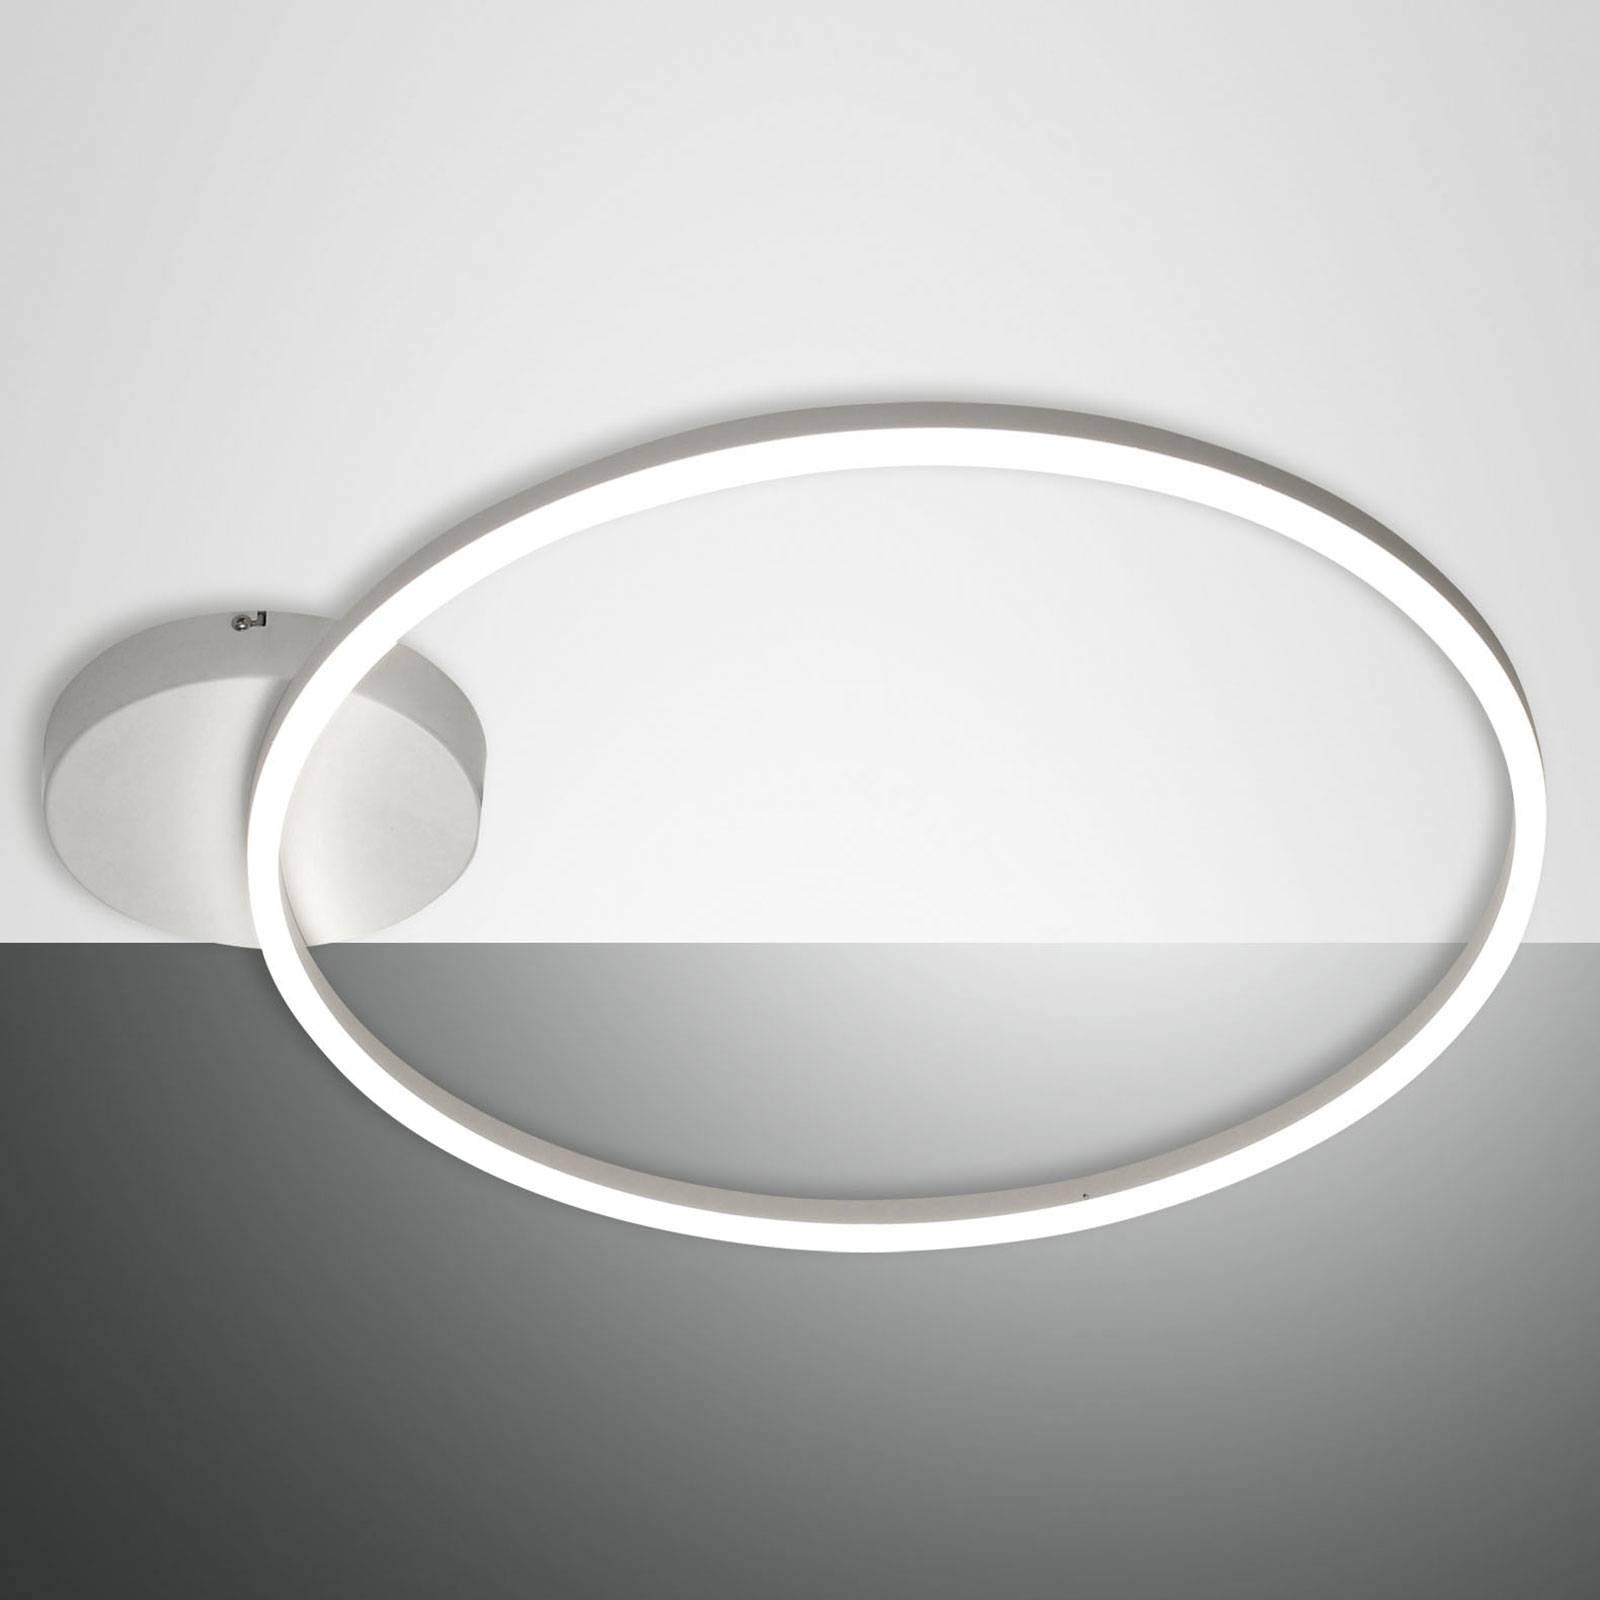 Lampa sufitowa LED Giotto 1-punktowa, biała